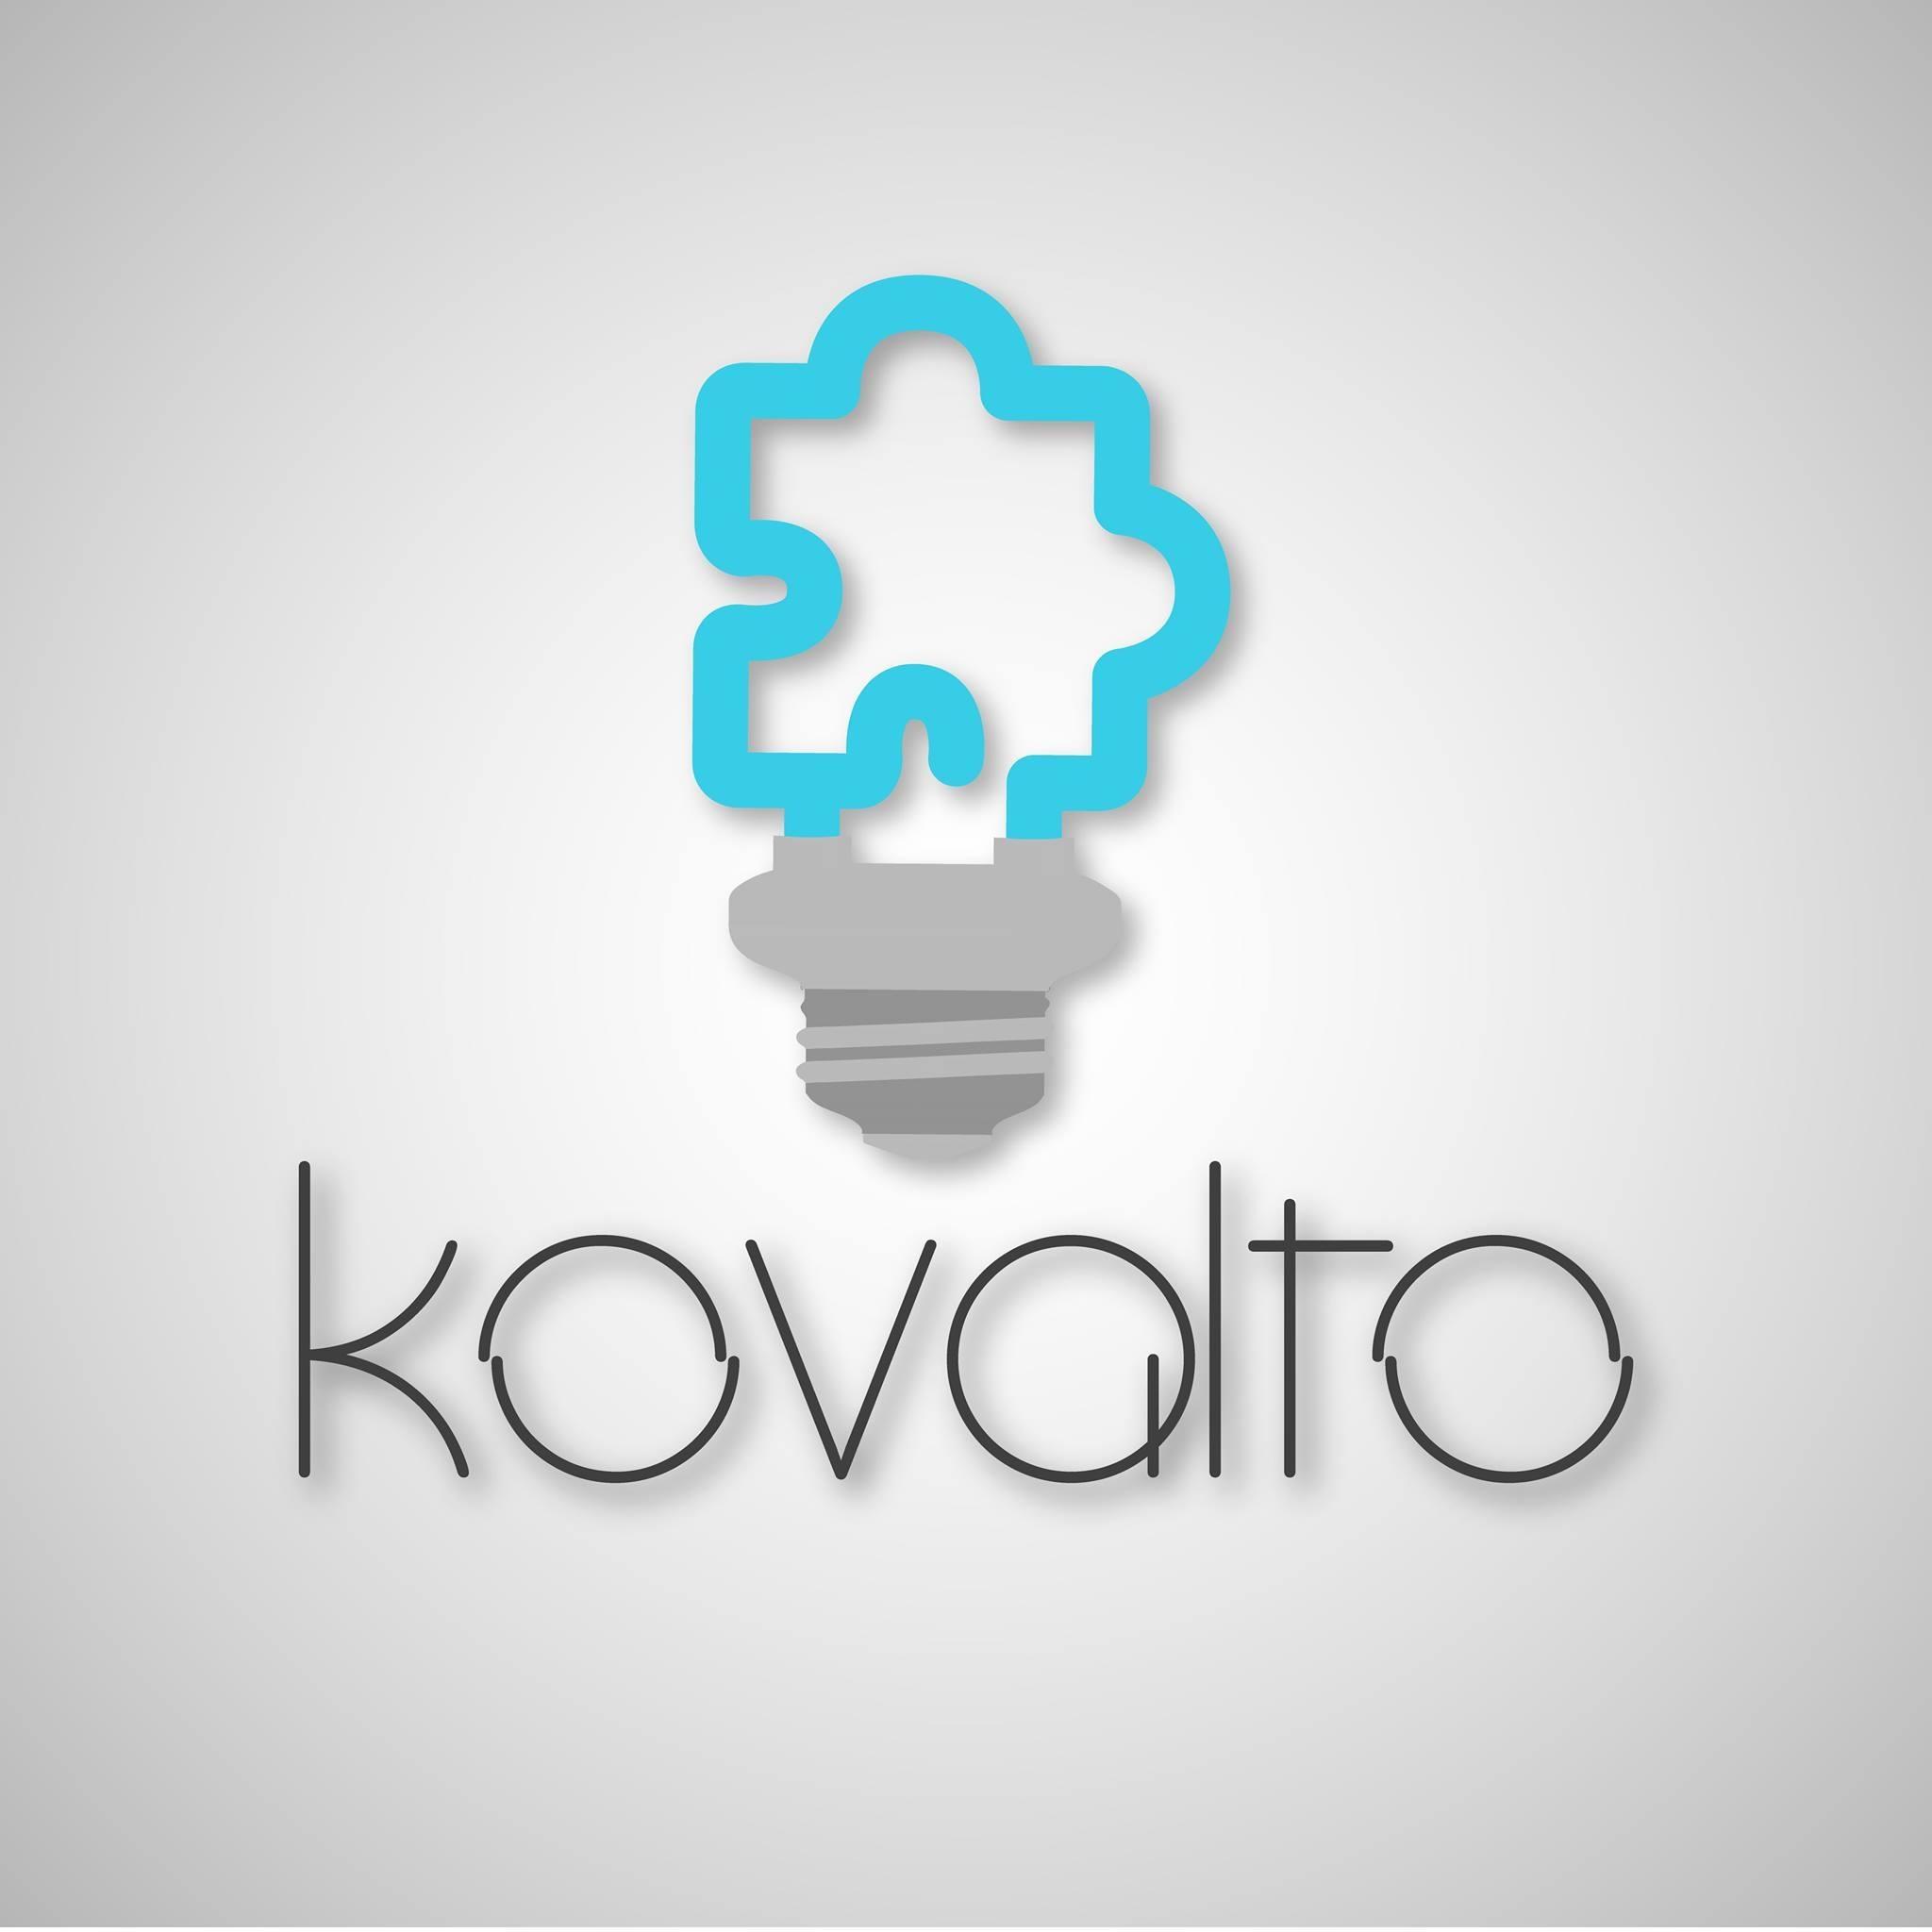 Kovalto Consulting